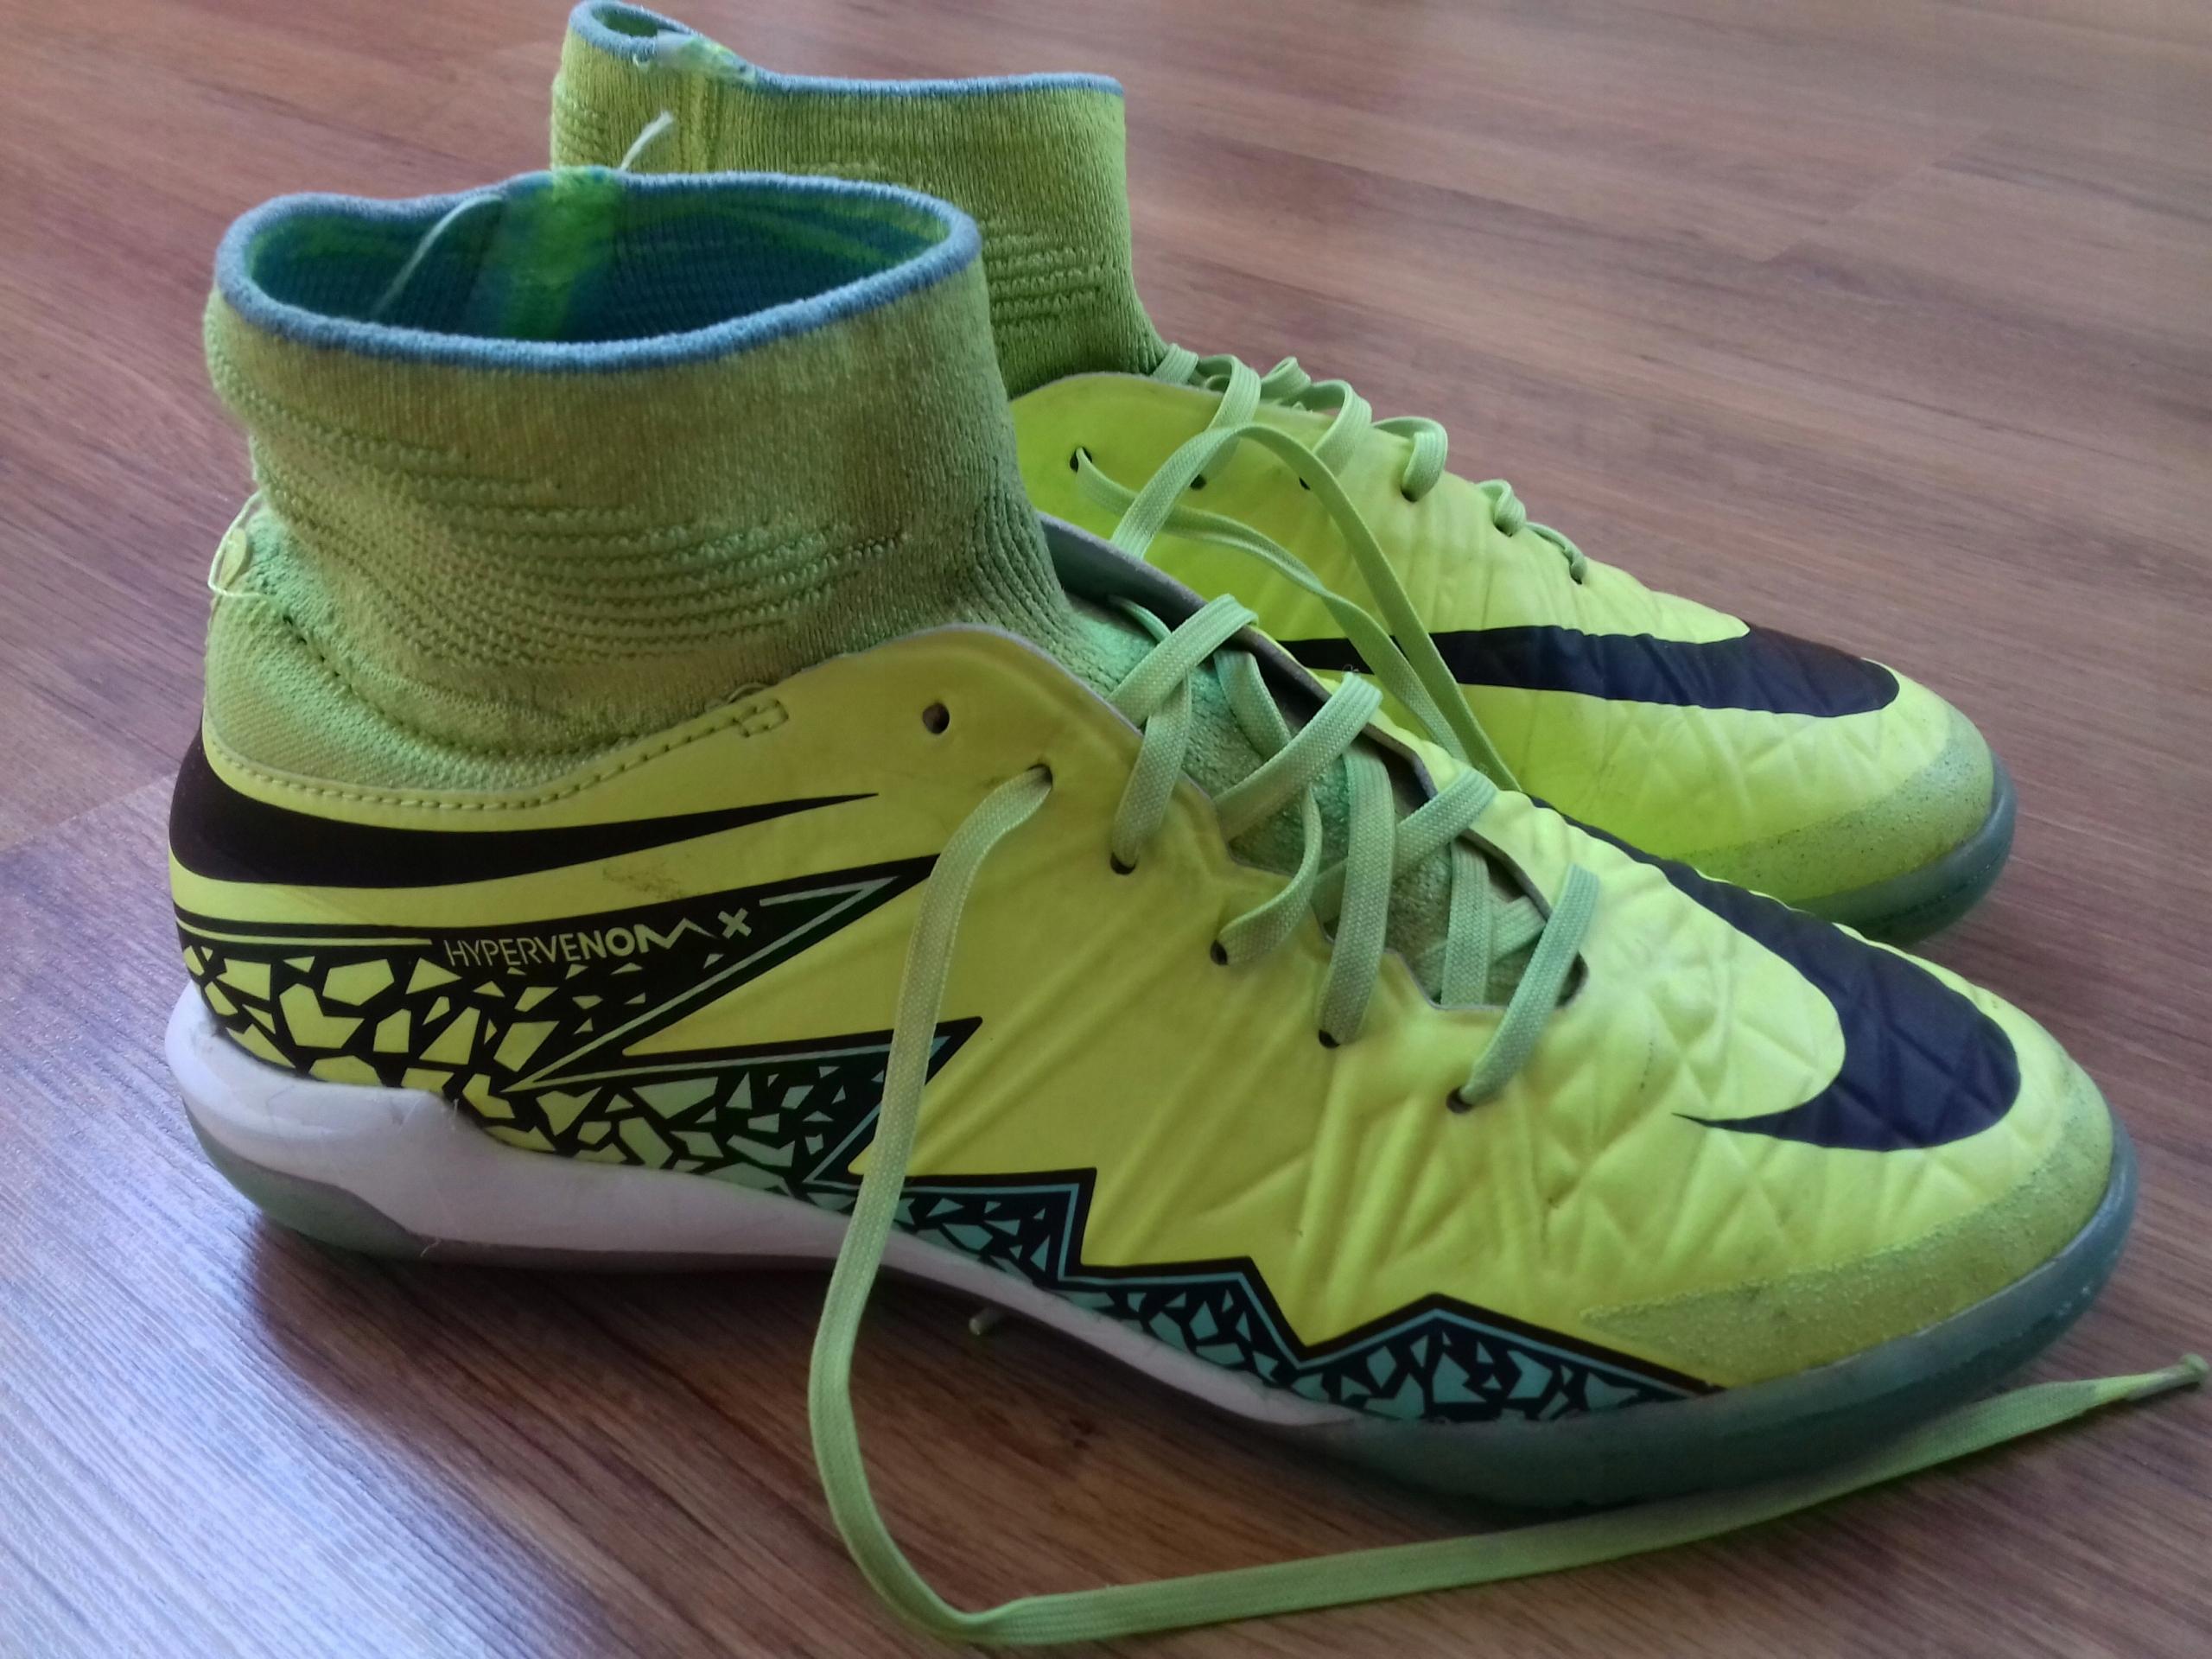 purchase cheap de4ed abacc Halówki Nike Hypervenom ze skarpetą rozm 36.5 HIT